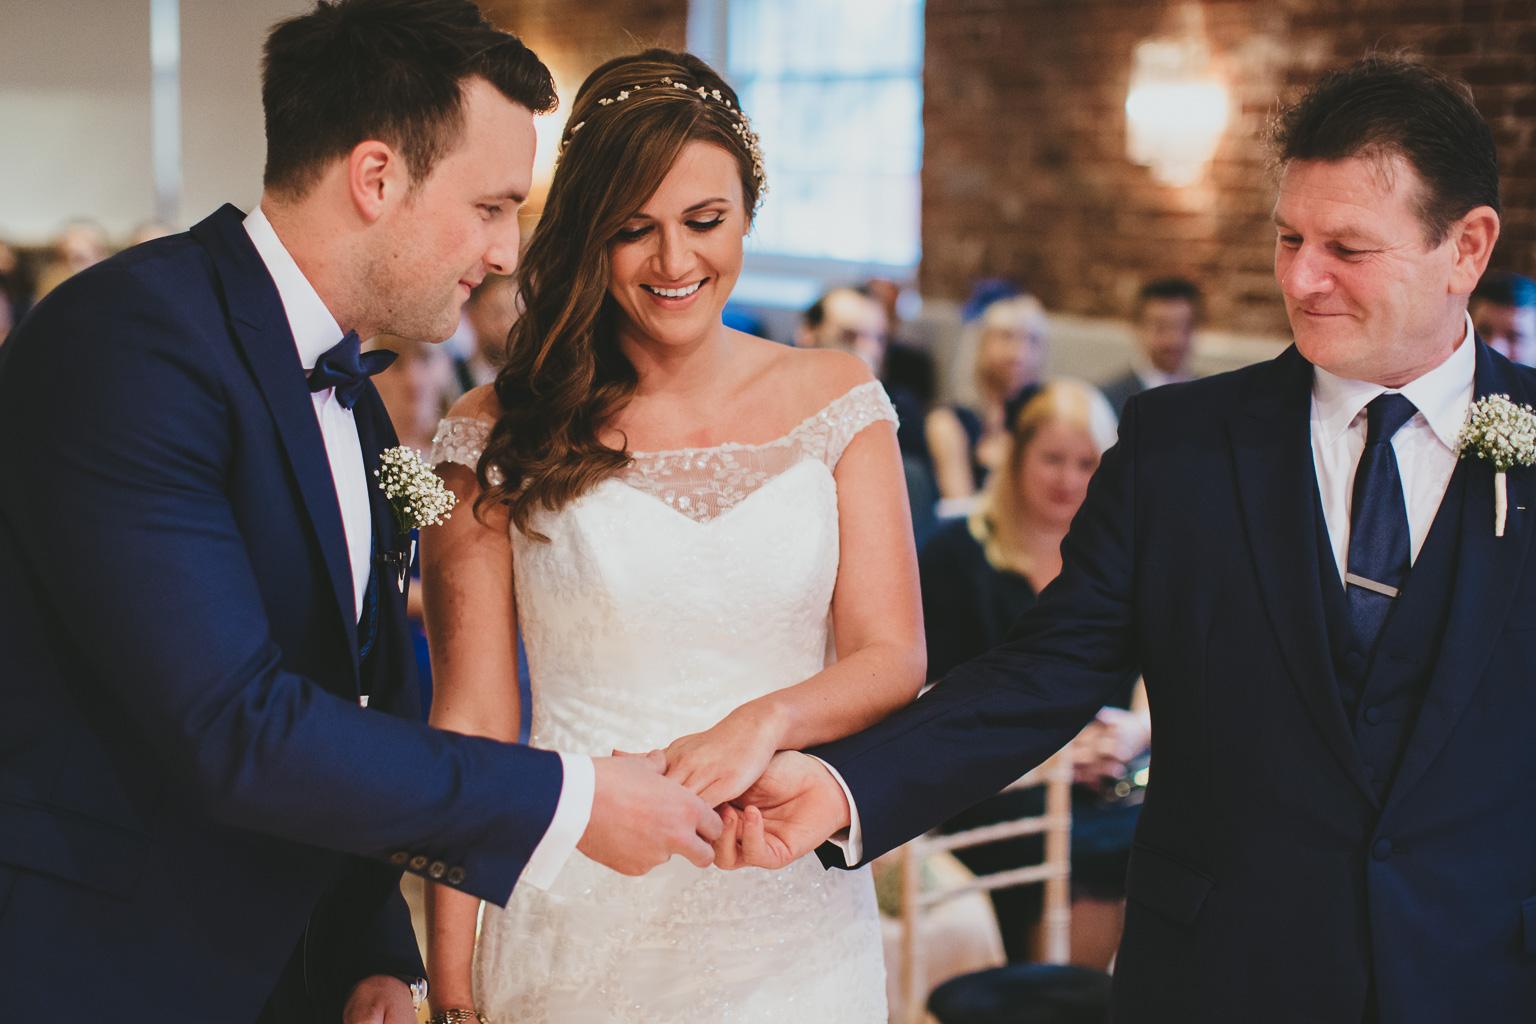 Creative-wedding-photography-00003